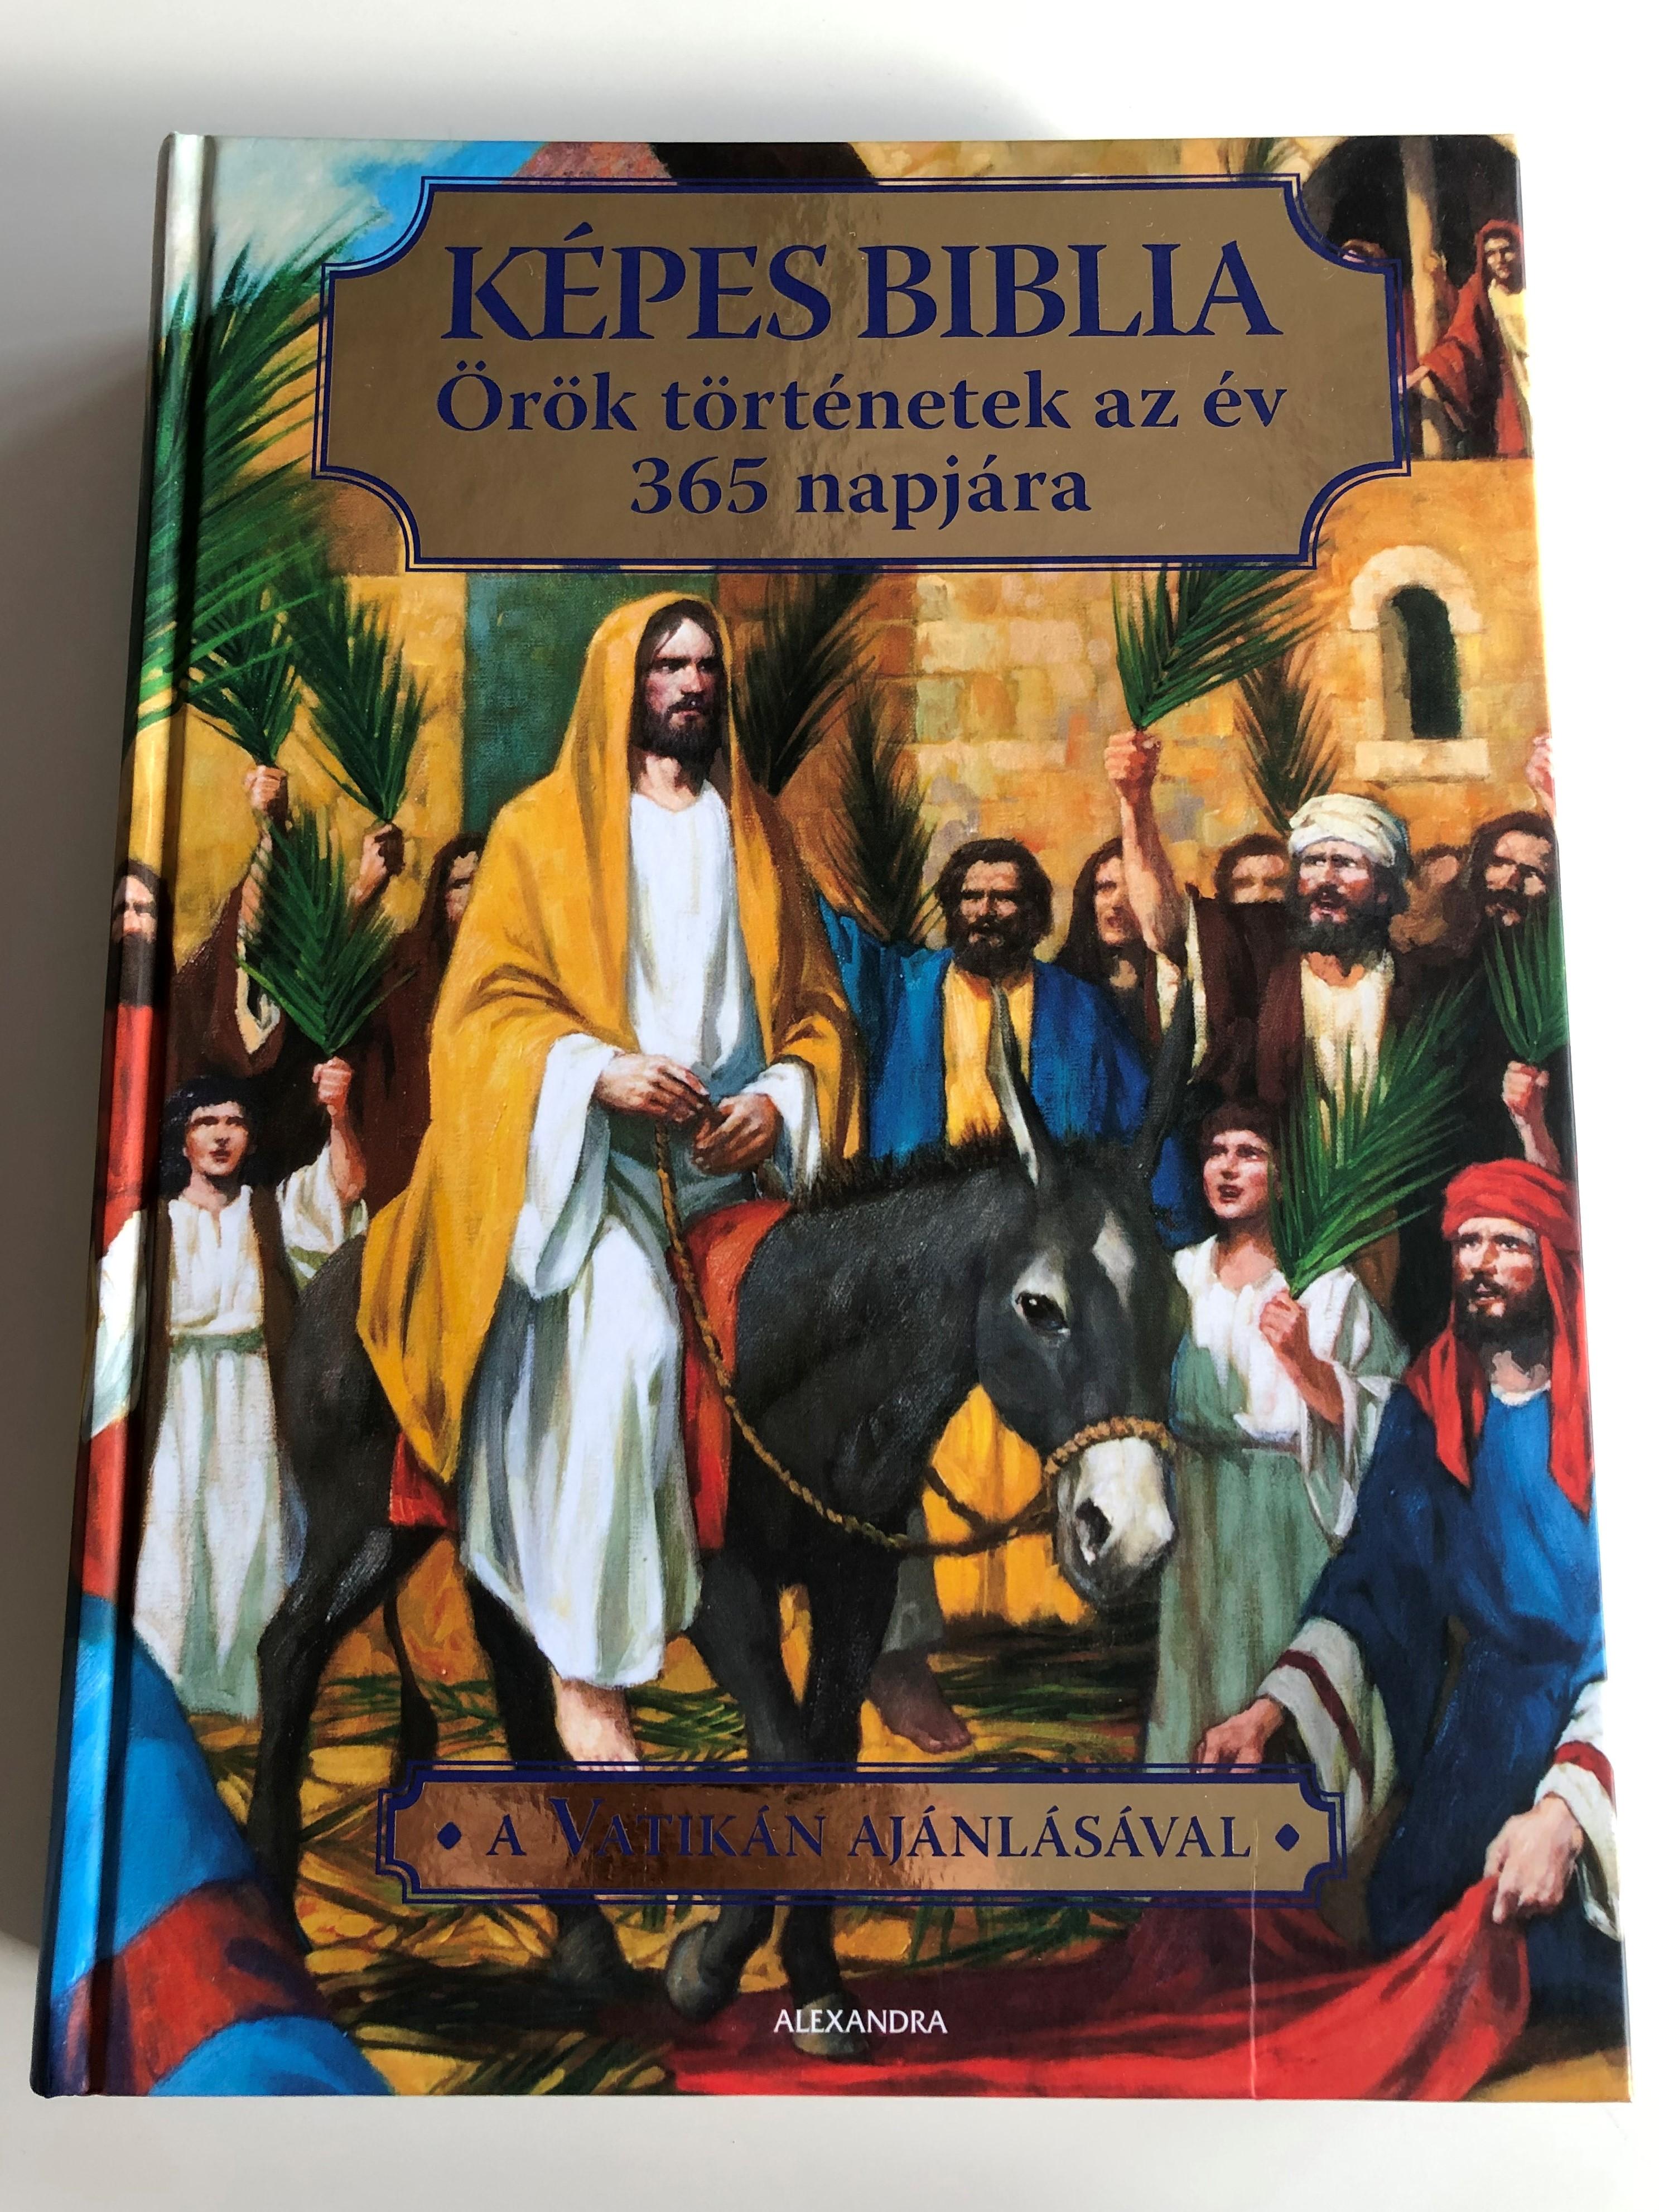 k-pes-biblia-r-k-t-rt-netek-az-s-365-napj-ra-hungarian-language-children-s-bible-stories-for-365-days-1.jpg